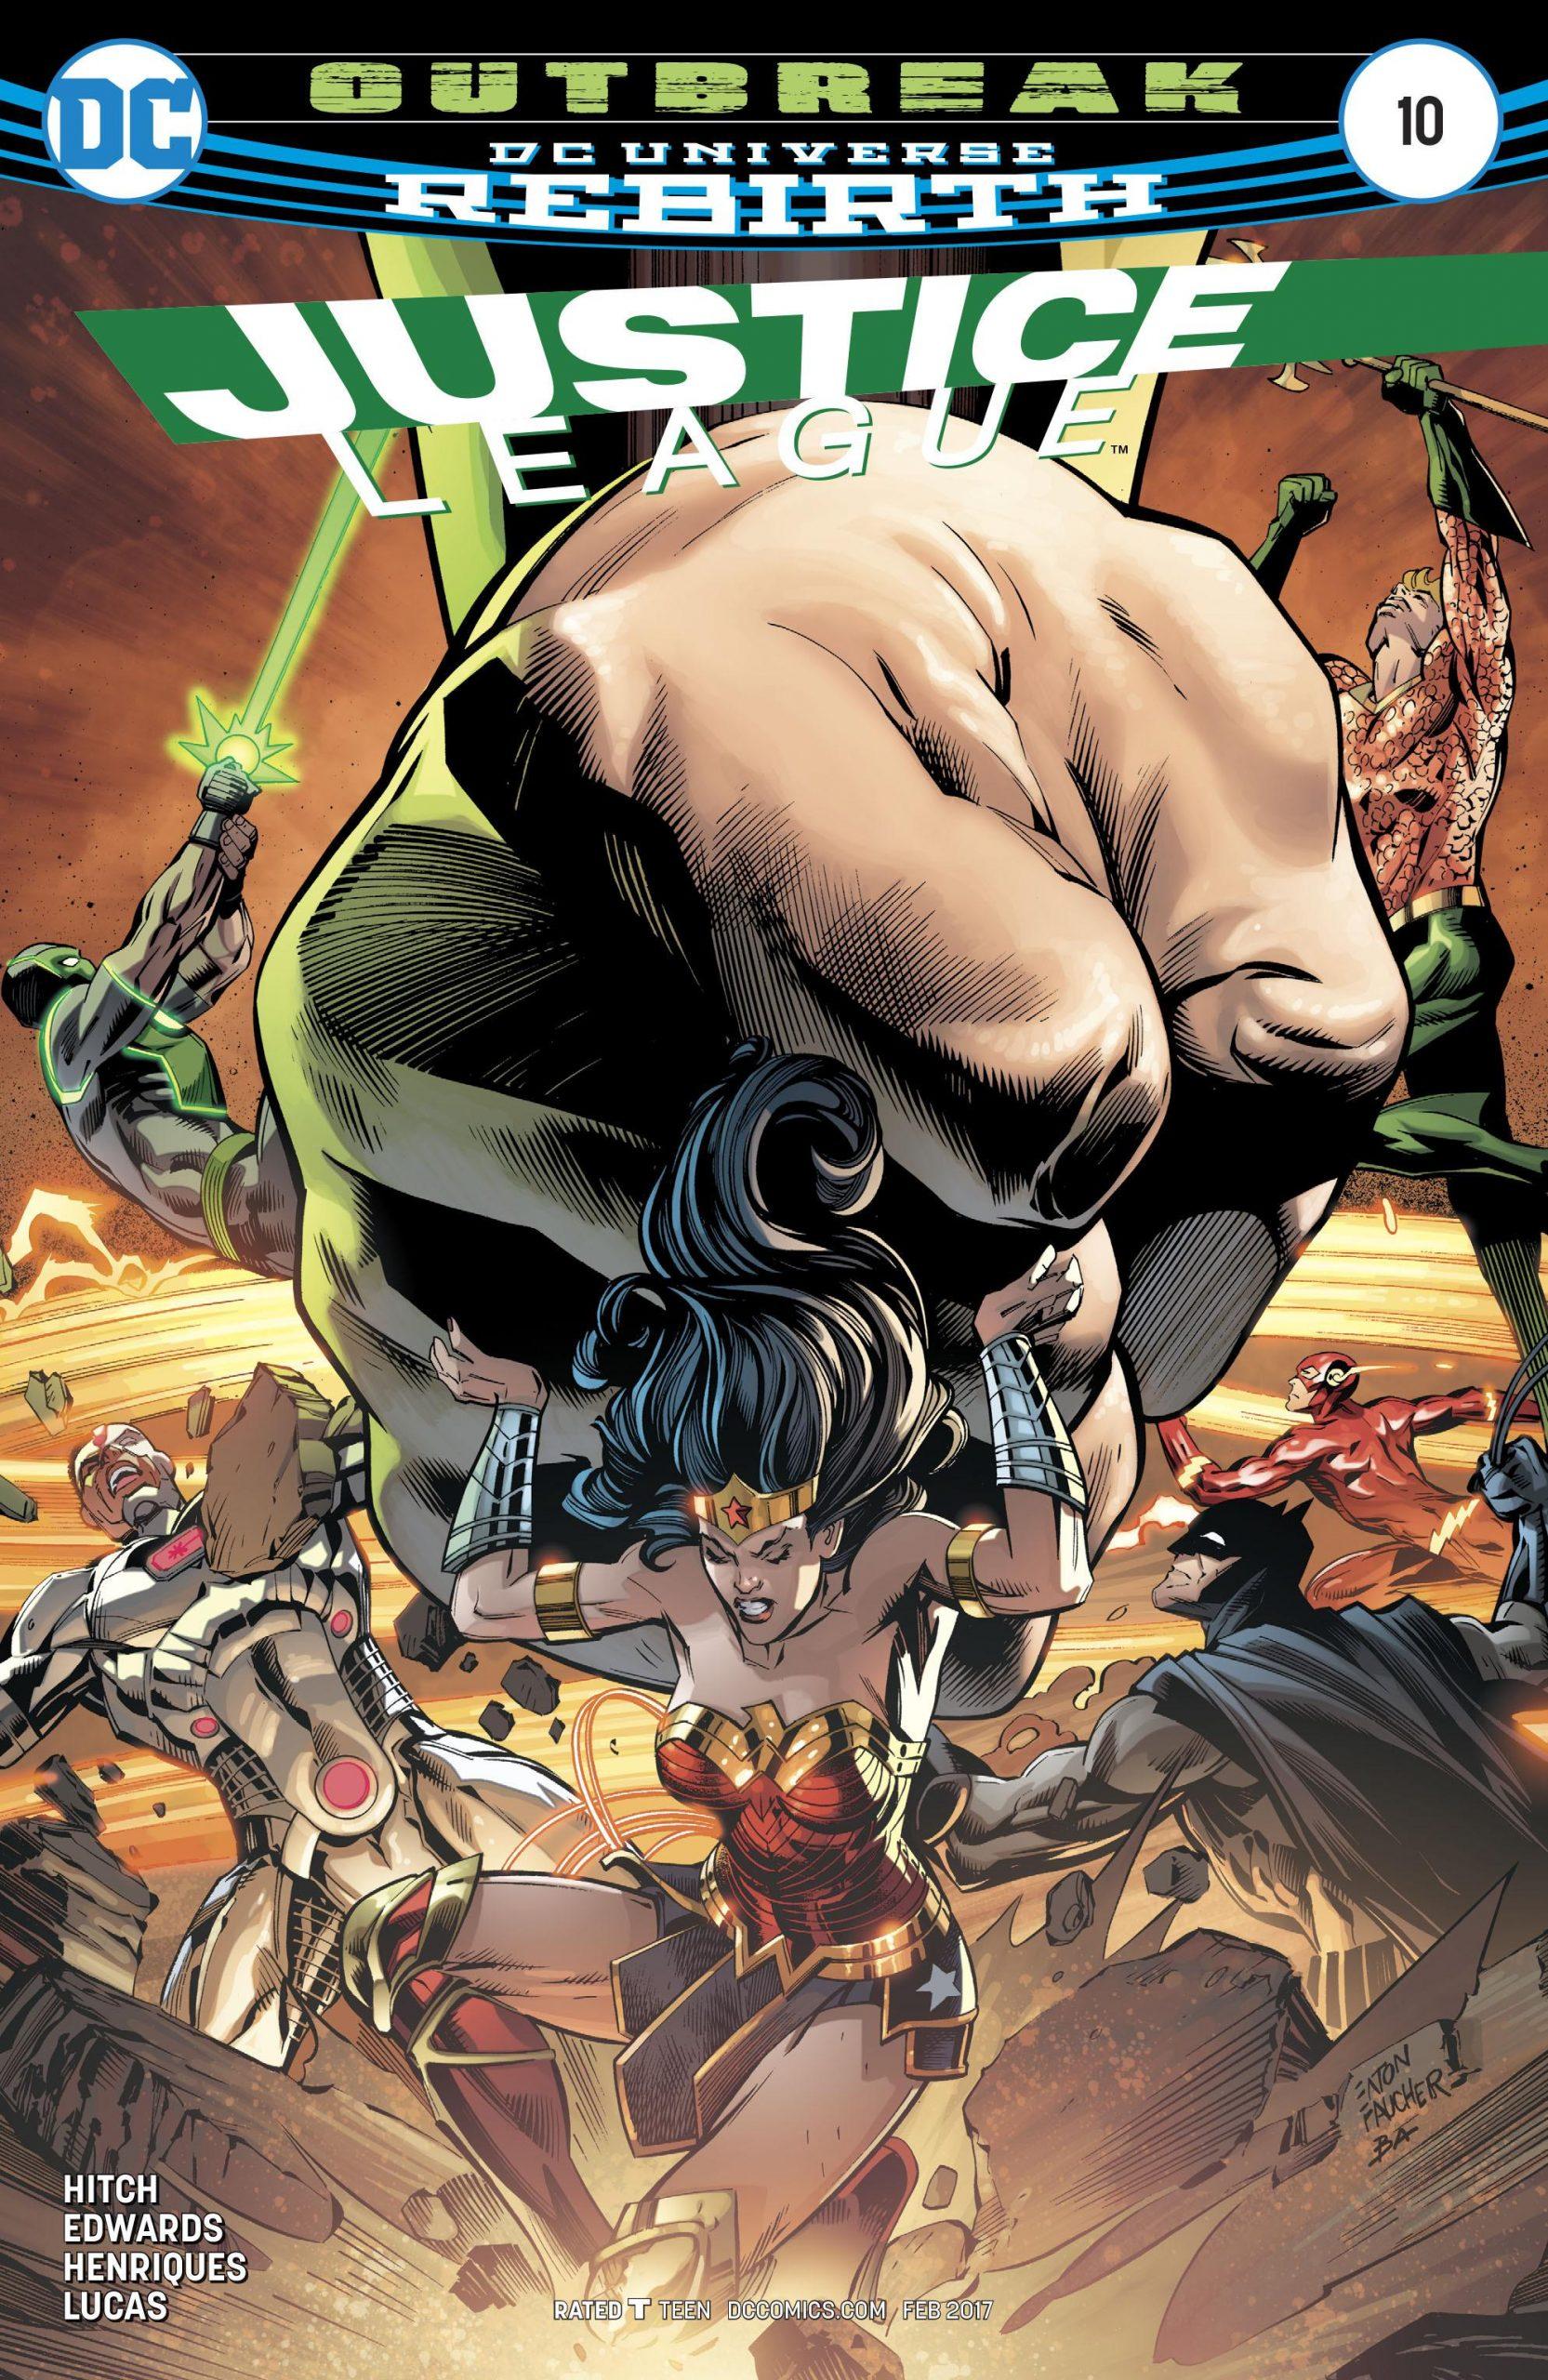 Justice League volume three issue 10